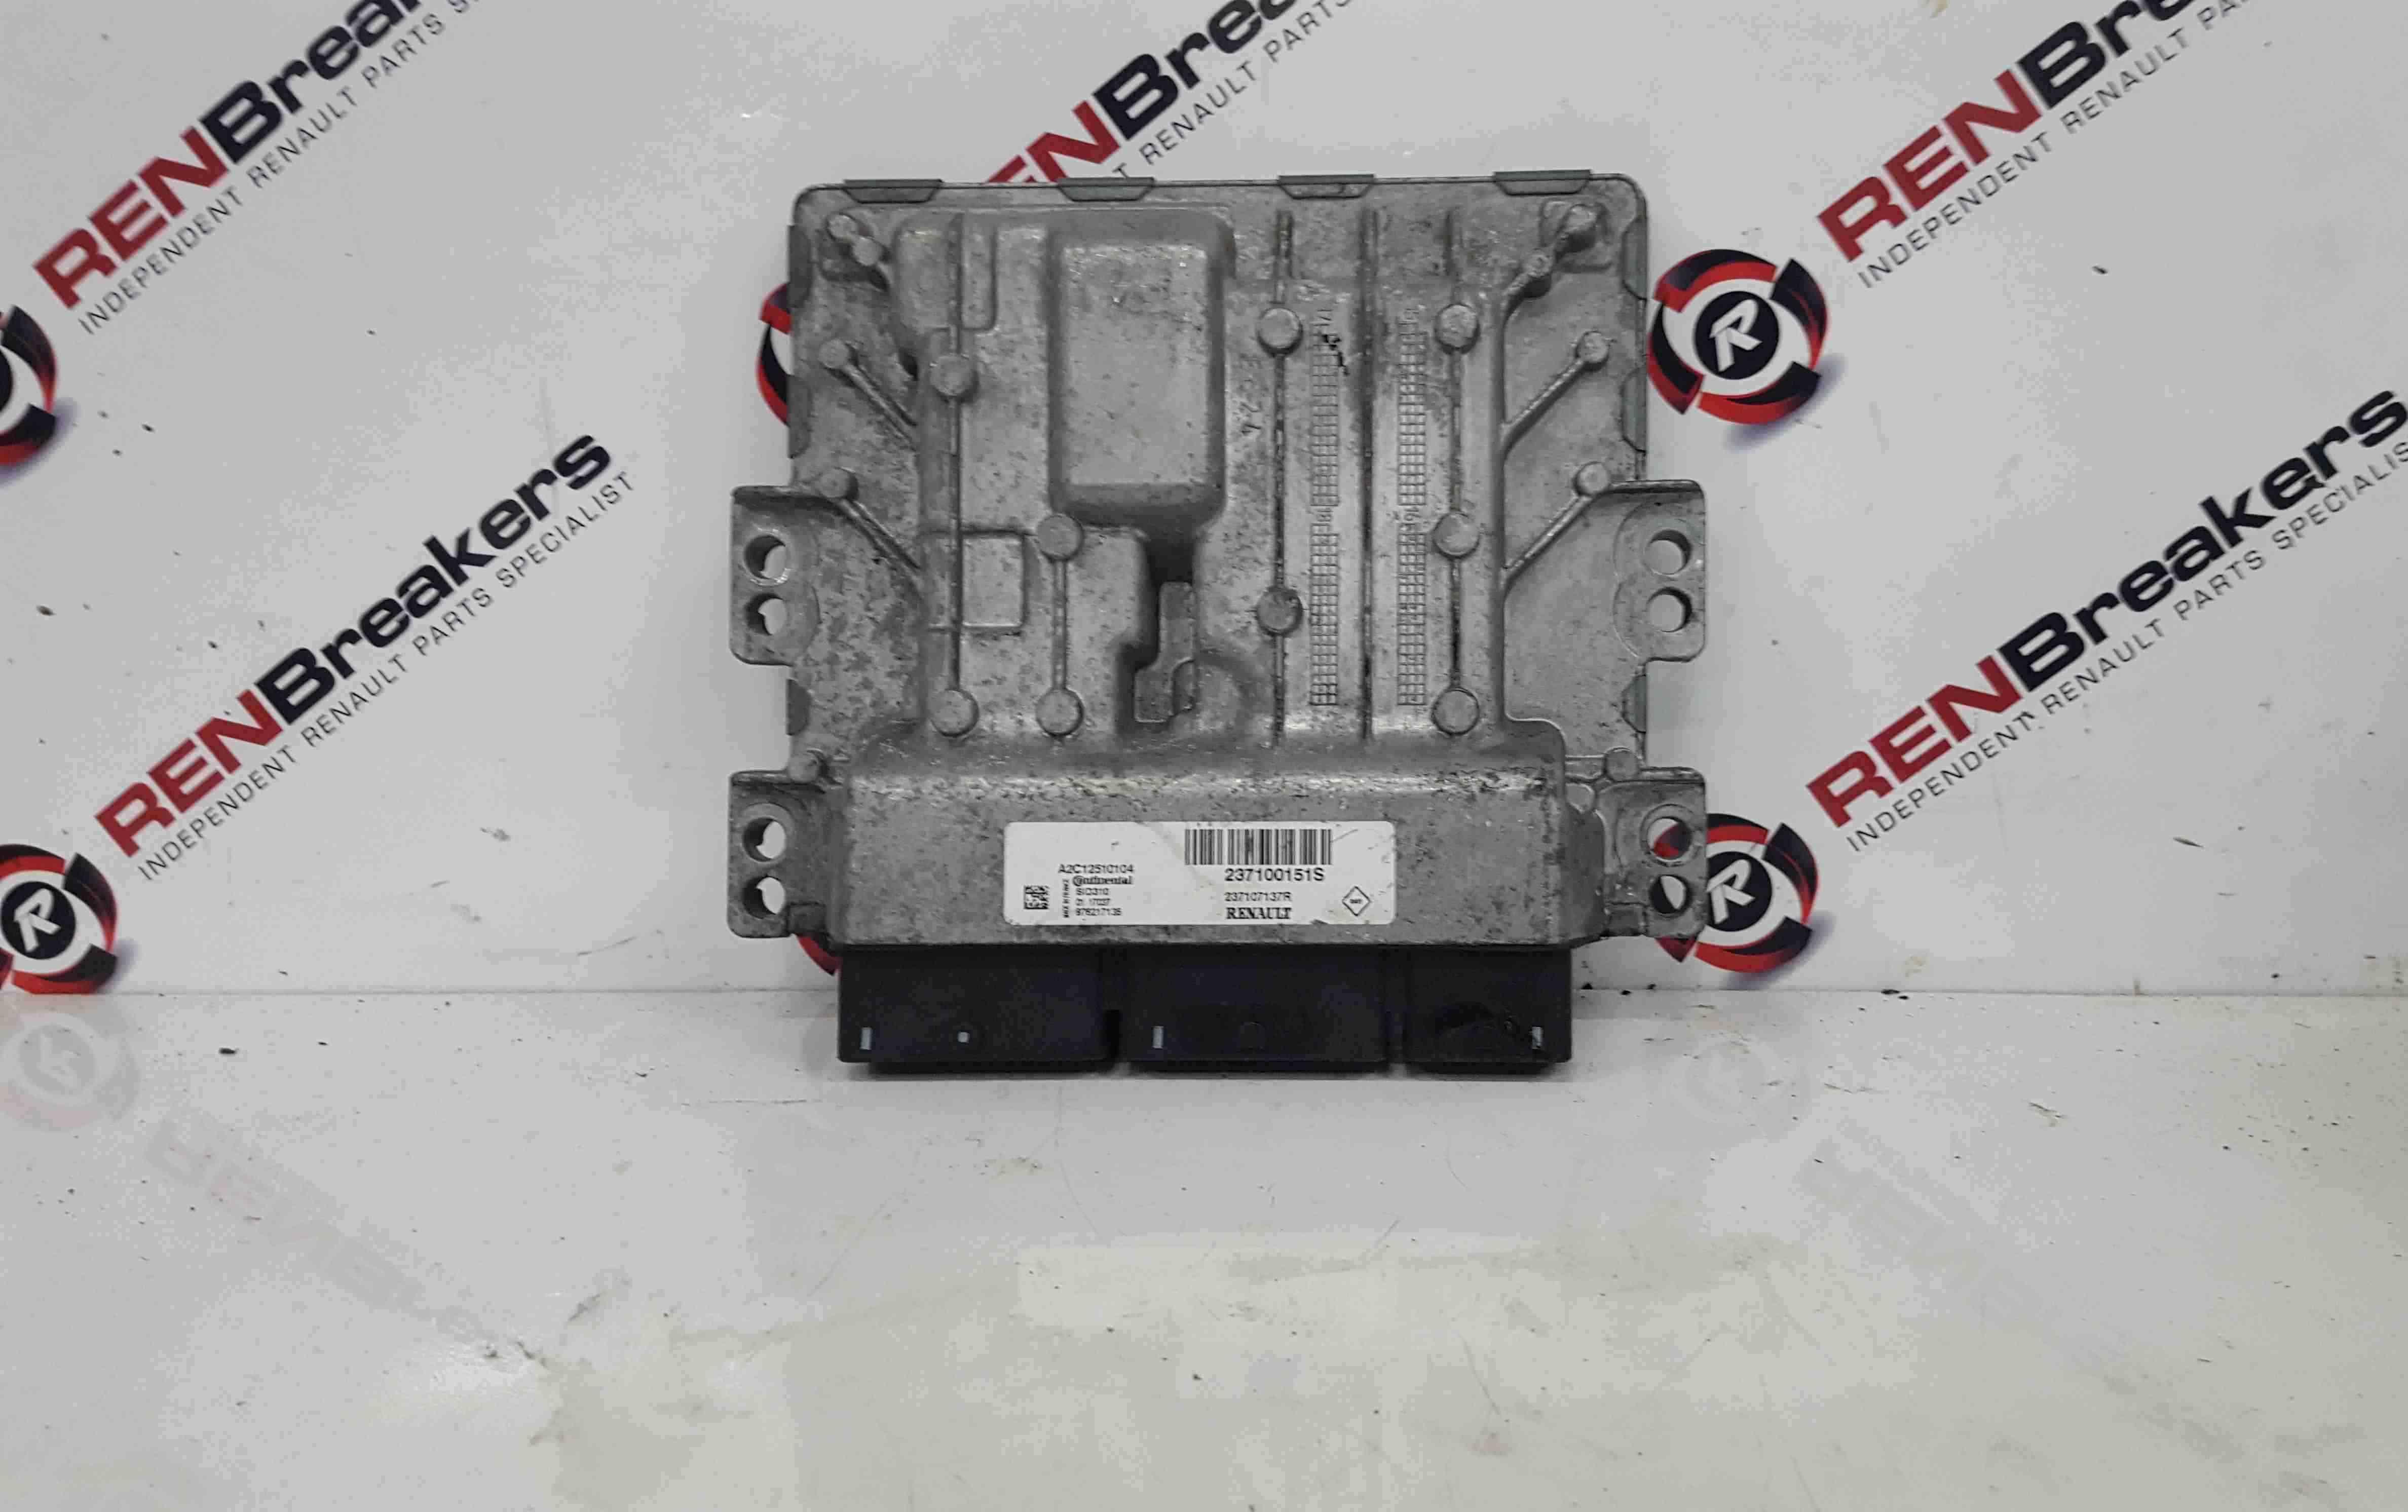 Renault Kadjar 2015-2021 1.5 DCi Engine Control ECU Computer 237100151S